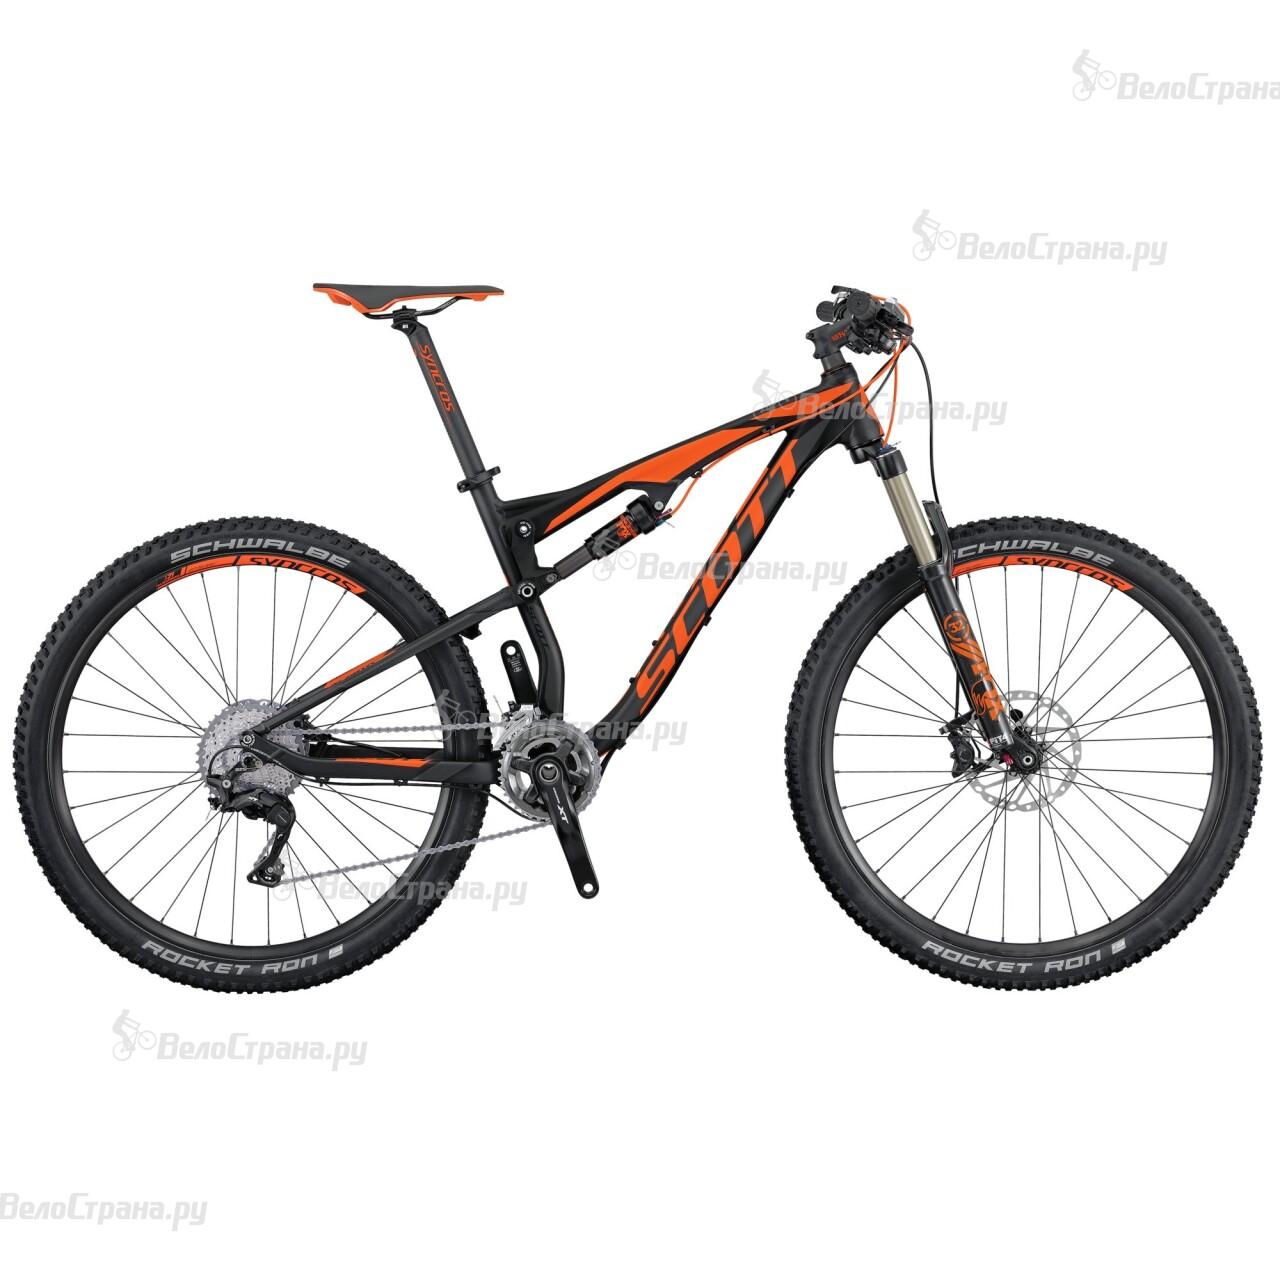 Велосипед Scott Spark 740 (2016) scott spark 740 2017